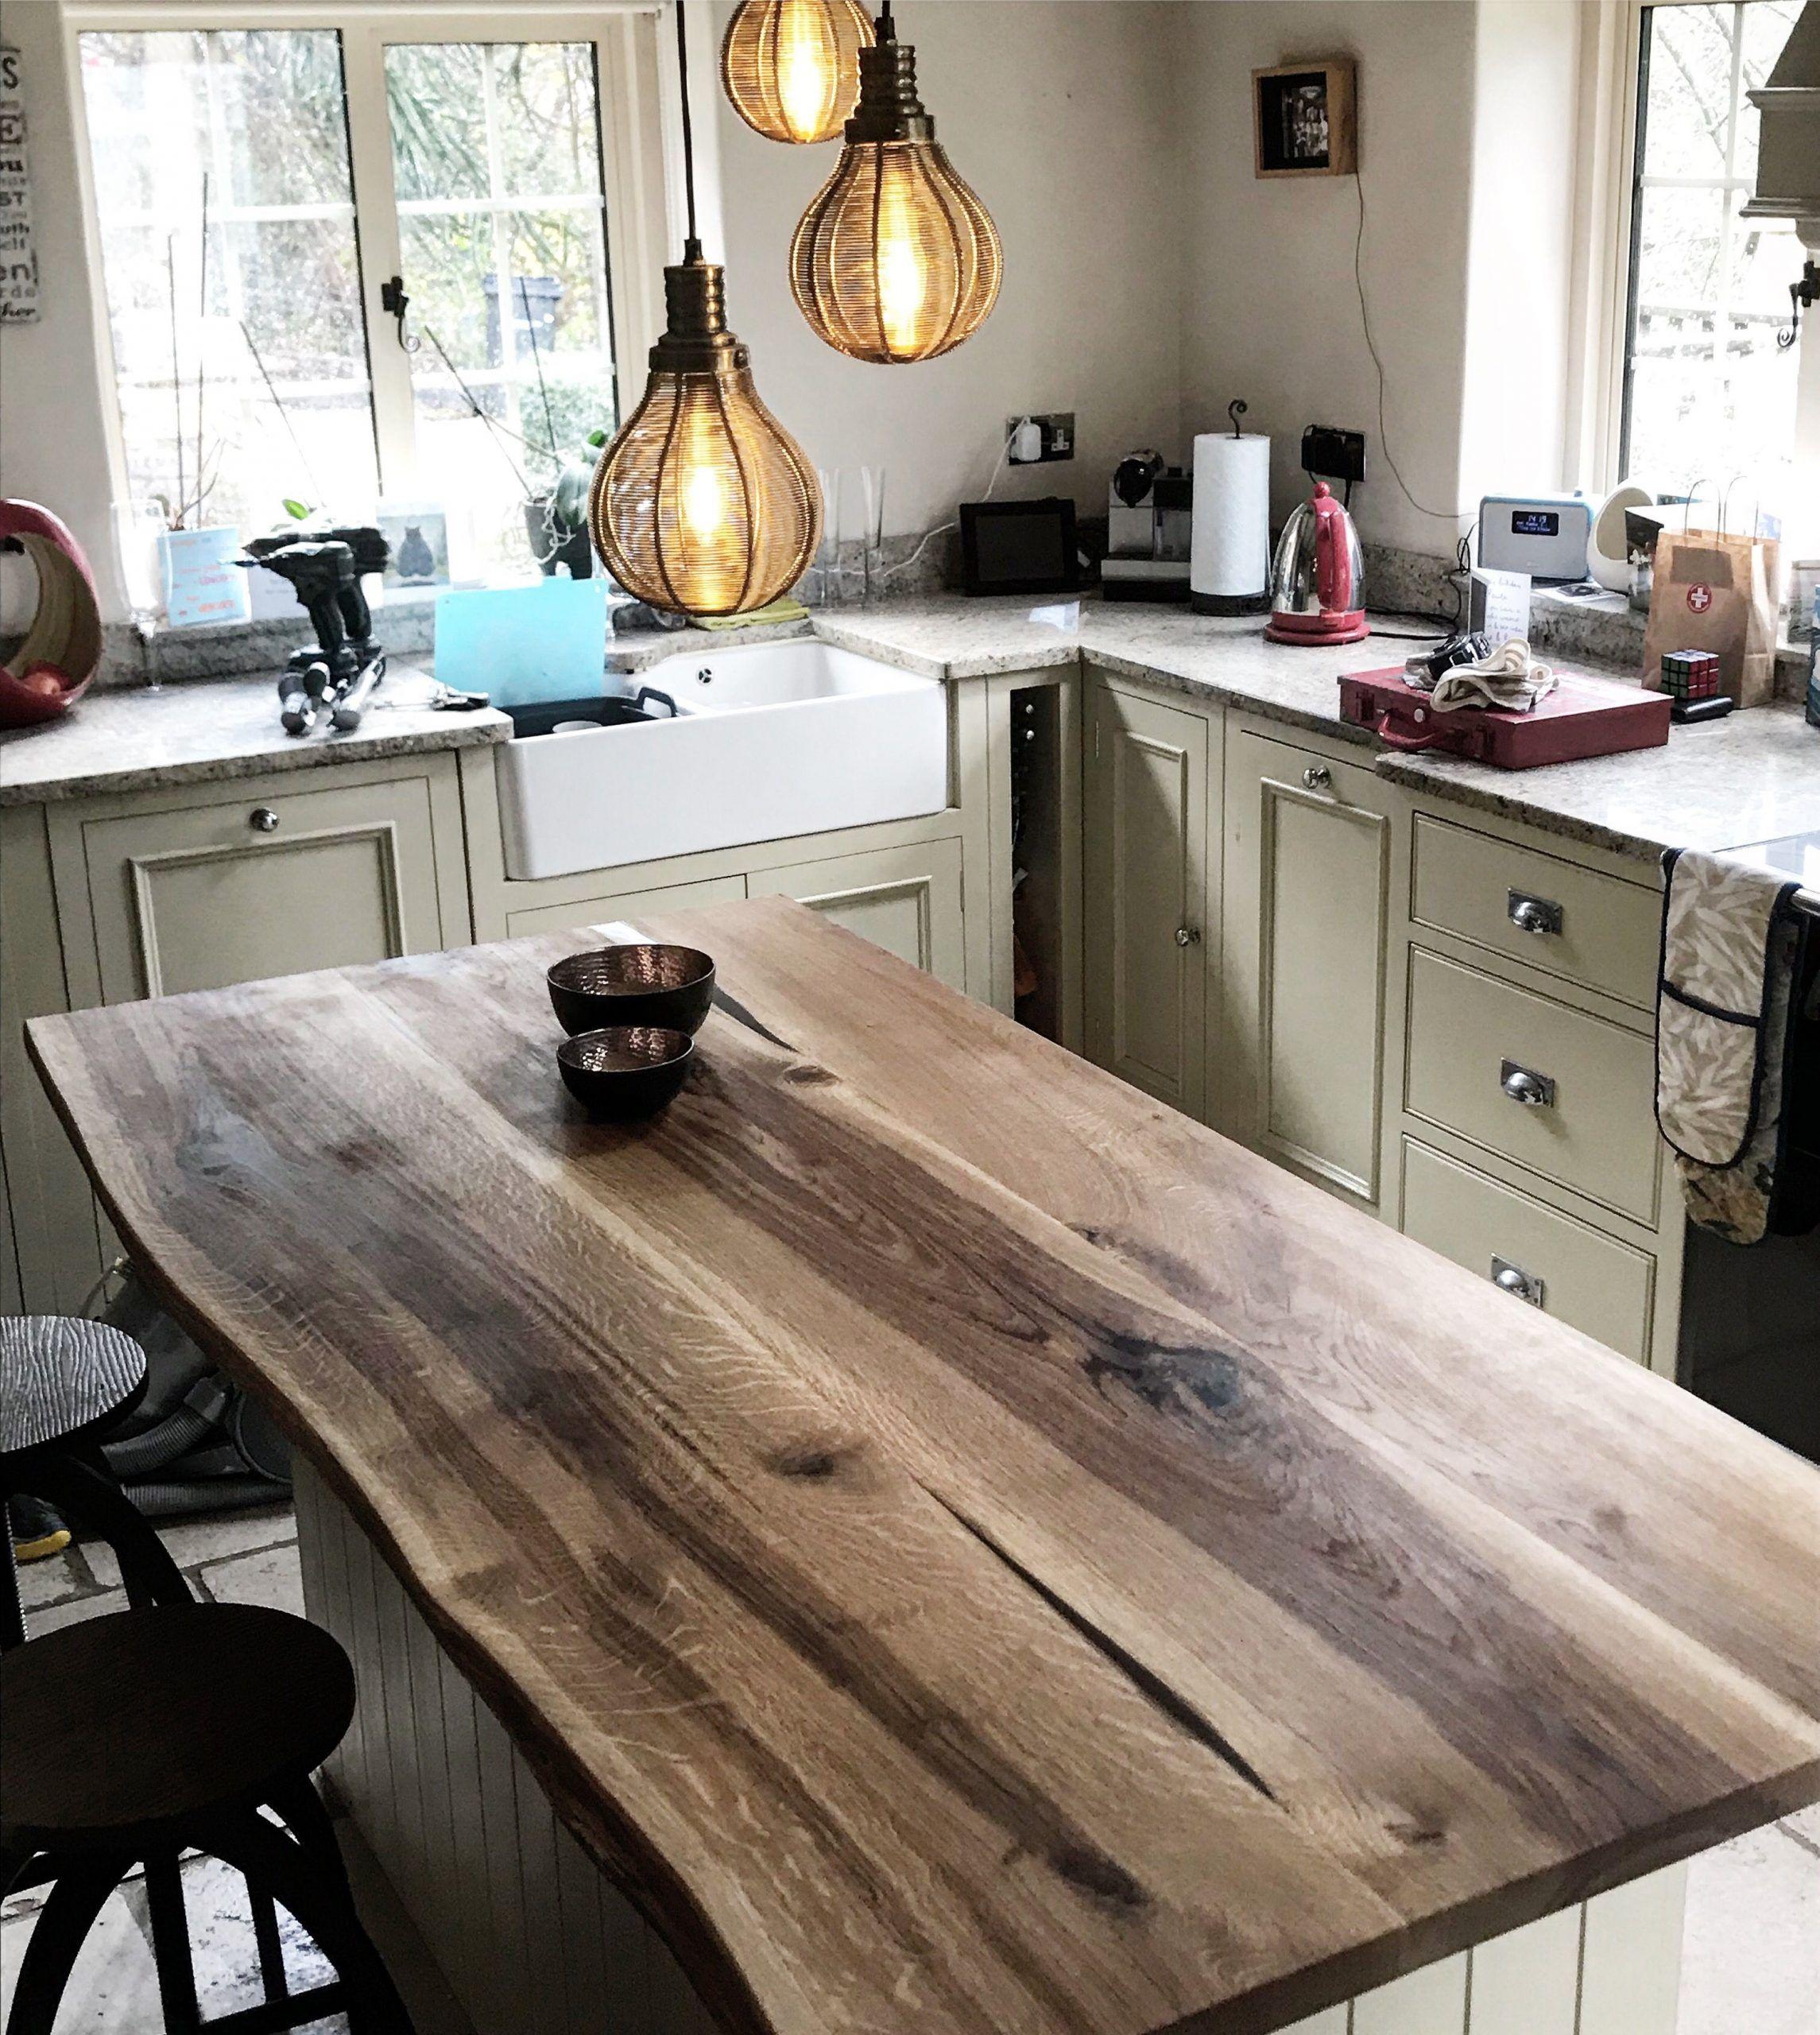 Live Edge Kitchen Island Von Earthy Timber England Unsere Live Edge Kuche In 2020 Wood Countertops Kitchen Wood Countertops Kitchen Island Kitchen Island Decor